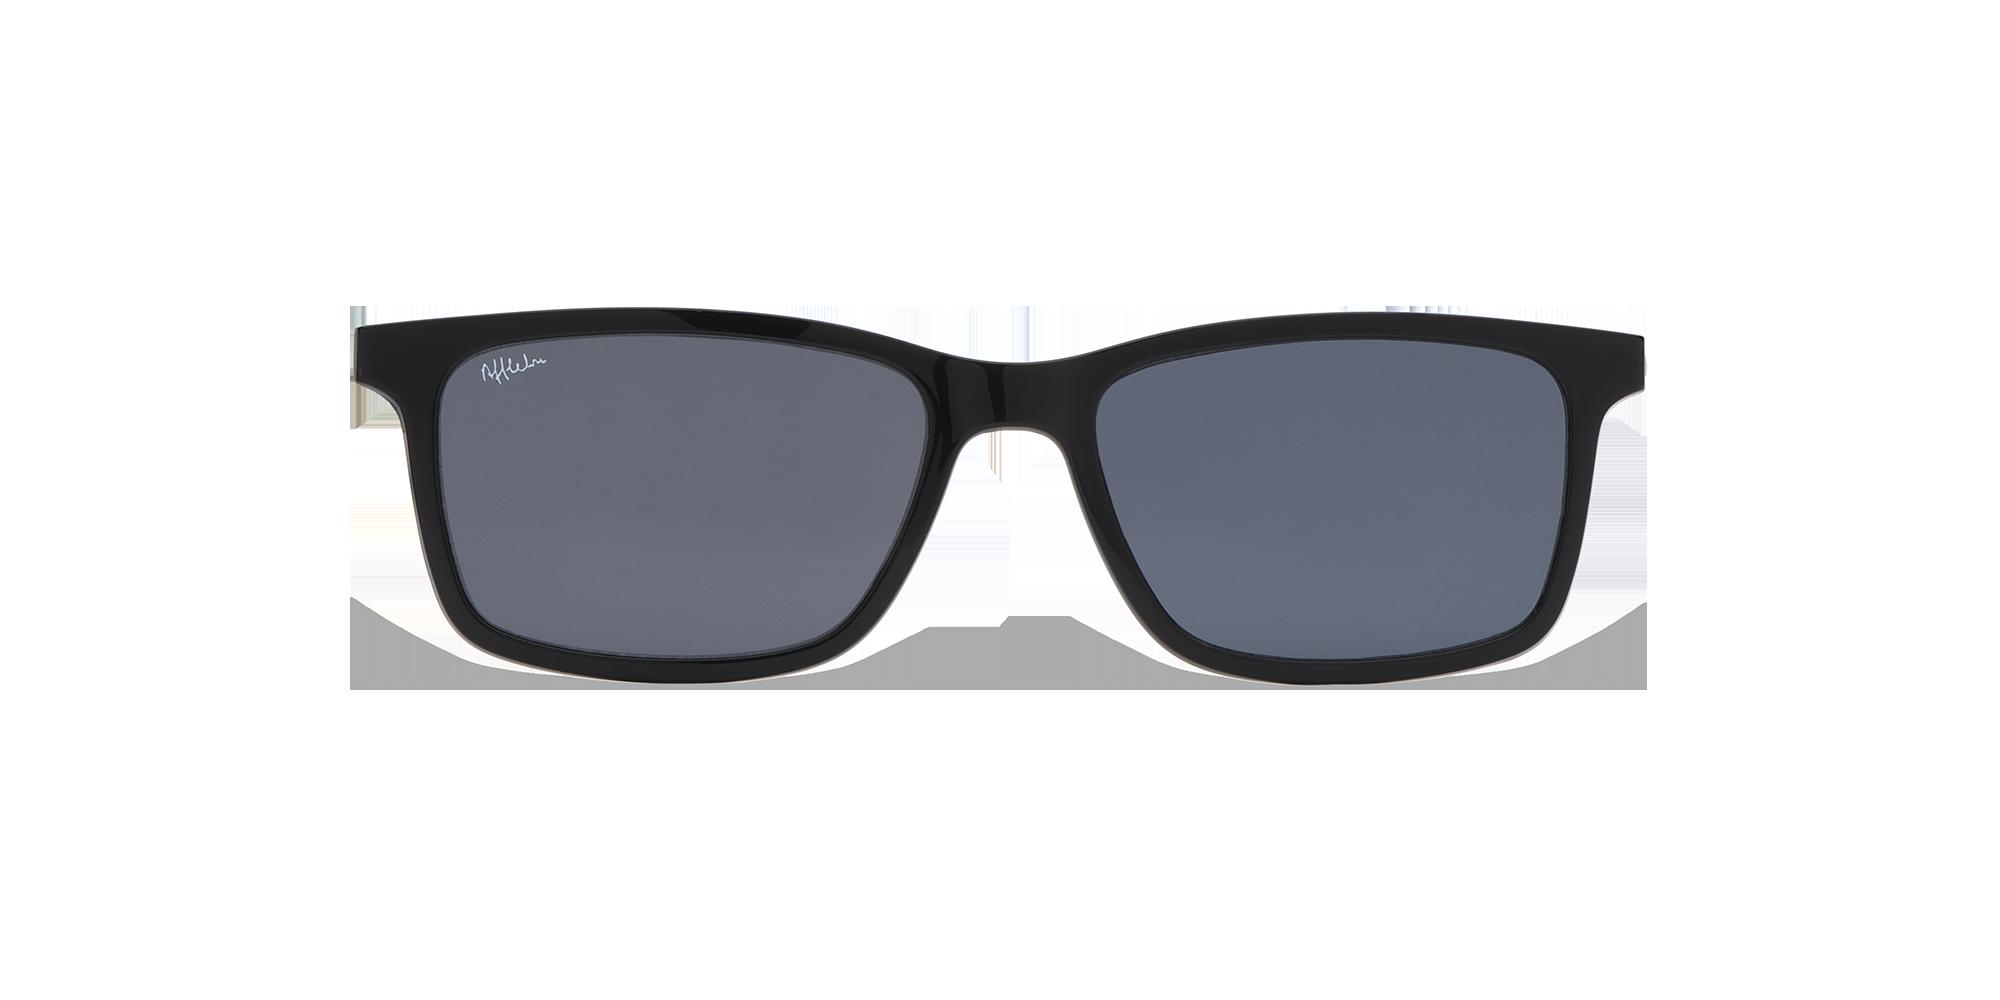 afflelou/france/products/smart_clip/clips_glasses/TMK32SUBK015316.png